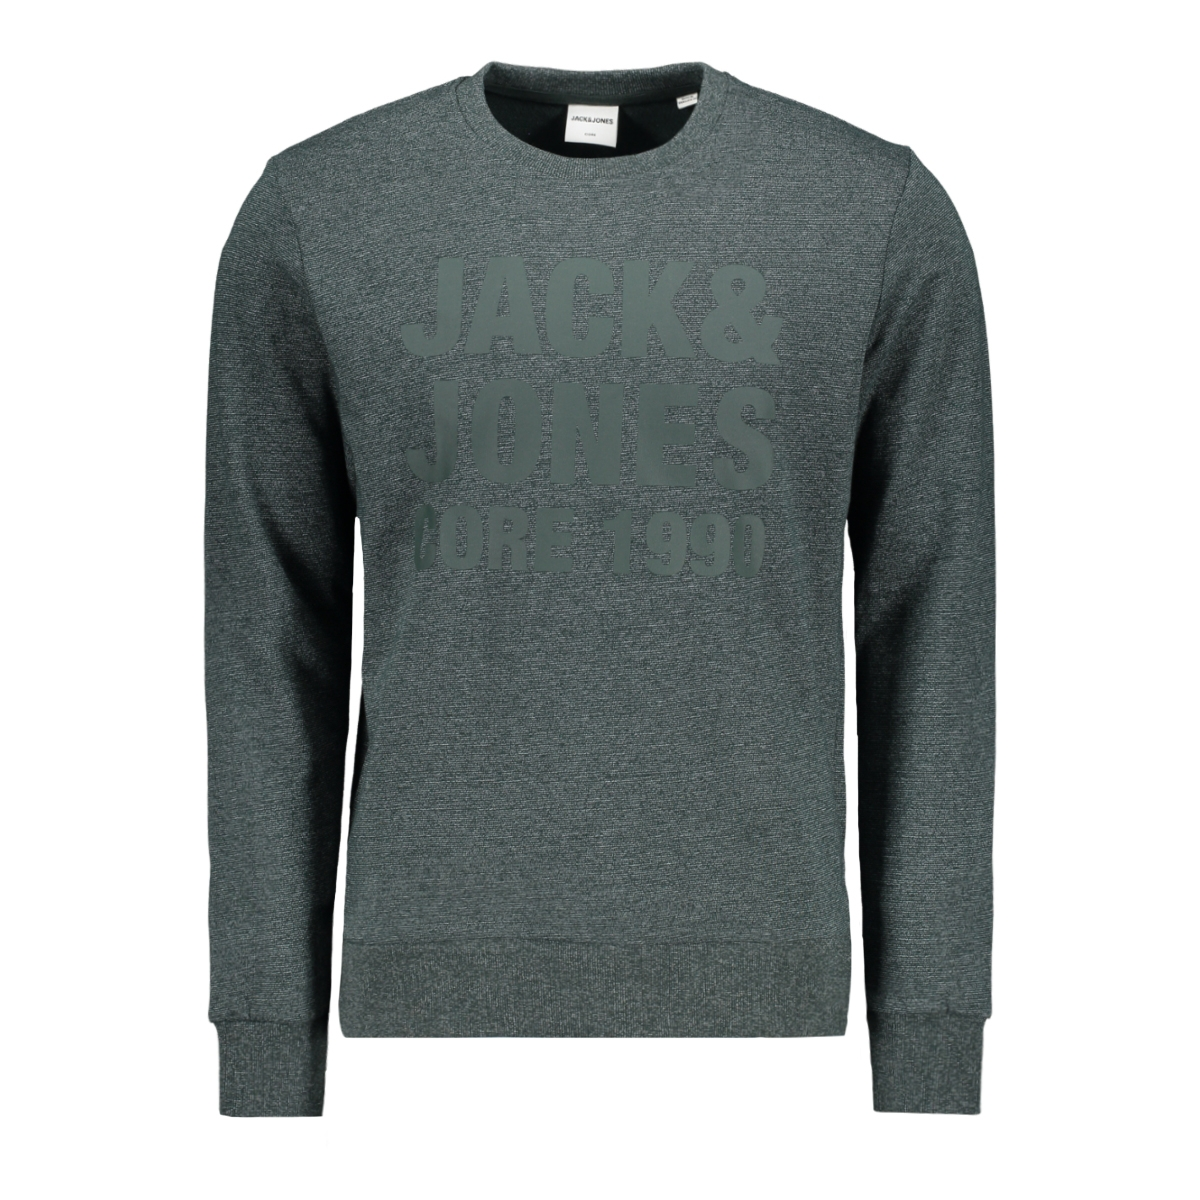 jcohuke sweat crew neck 12171070 jack & jones sweater darkest spruce/melange